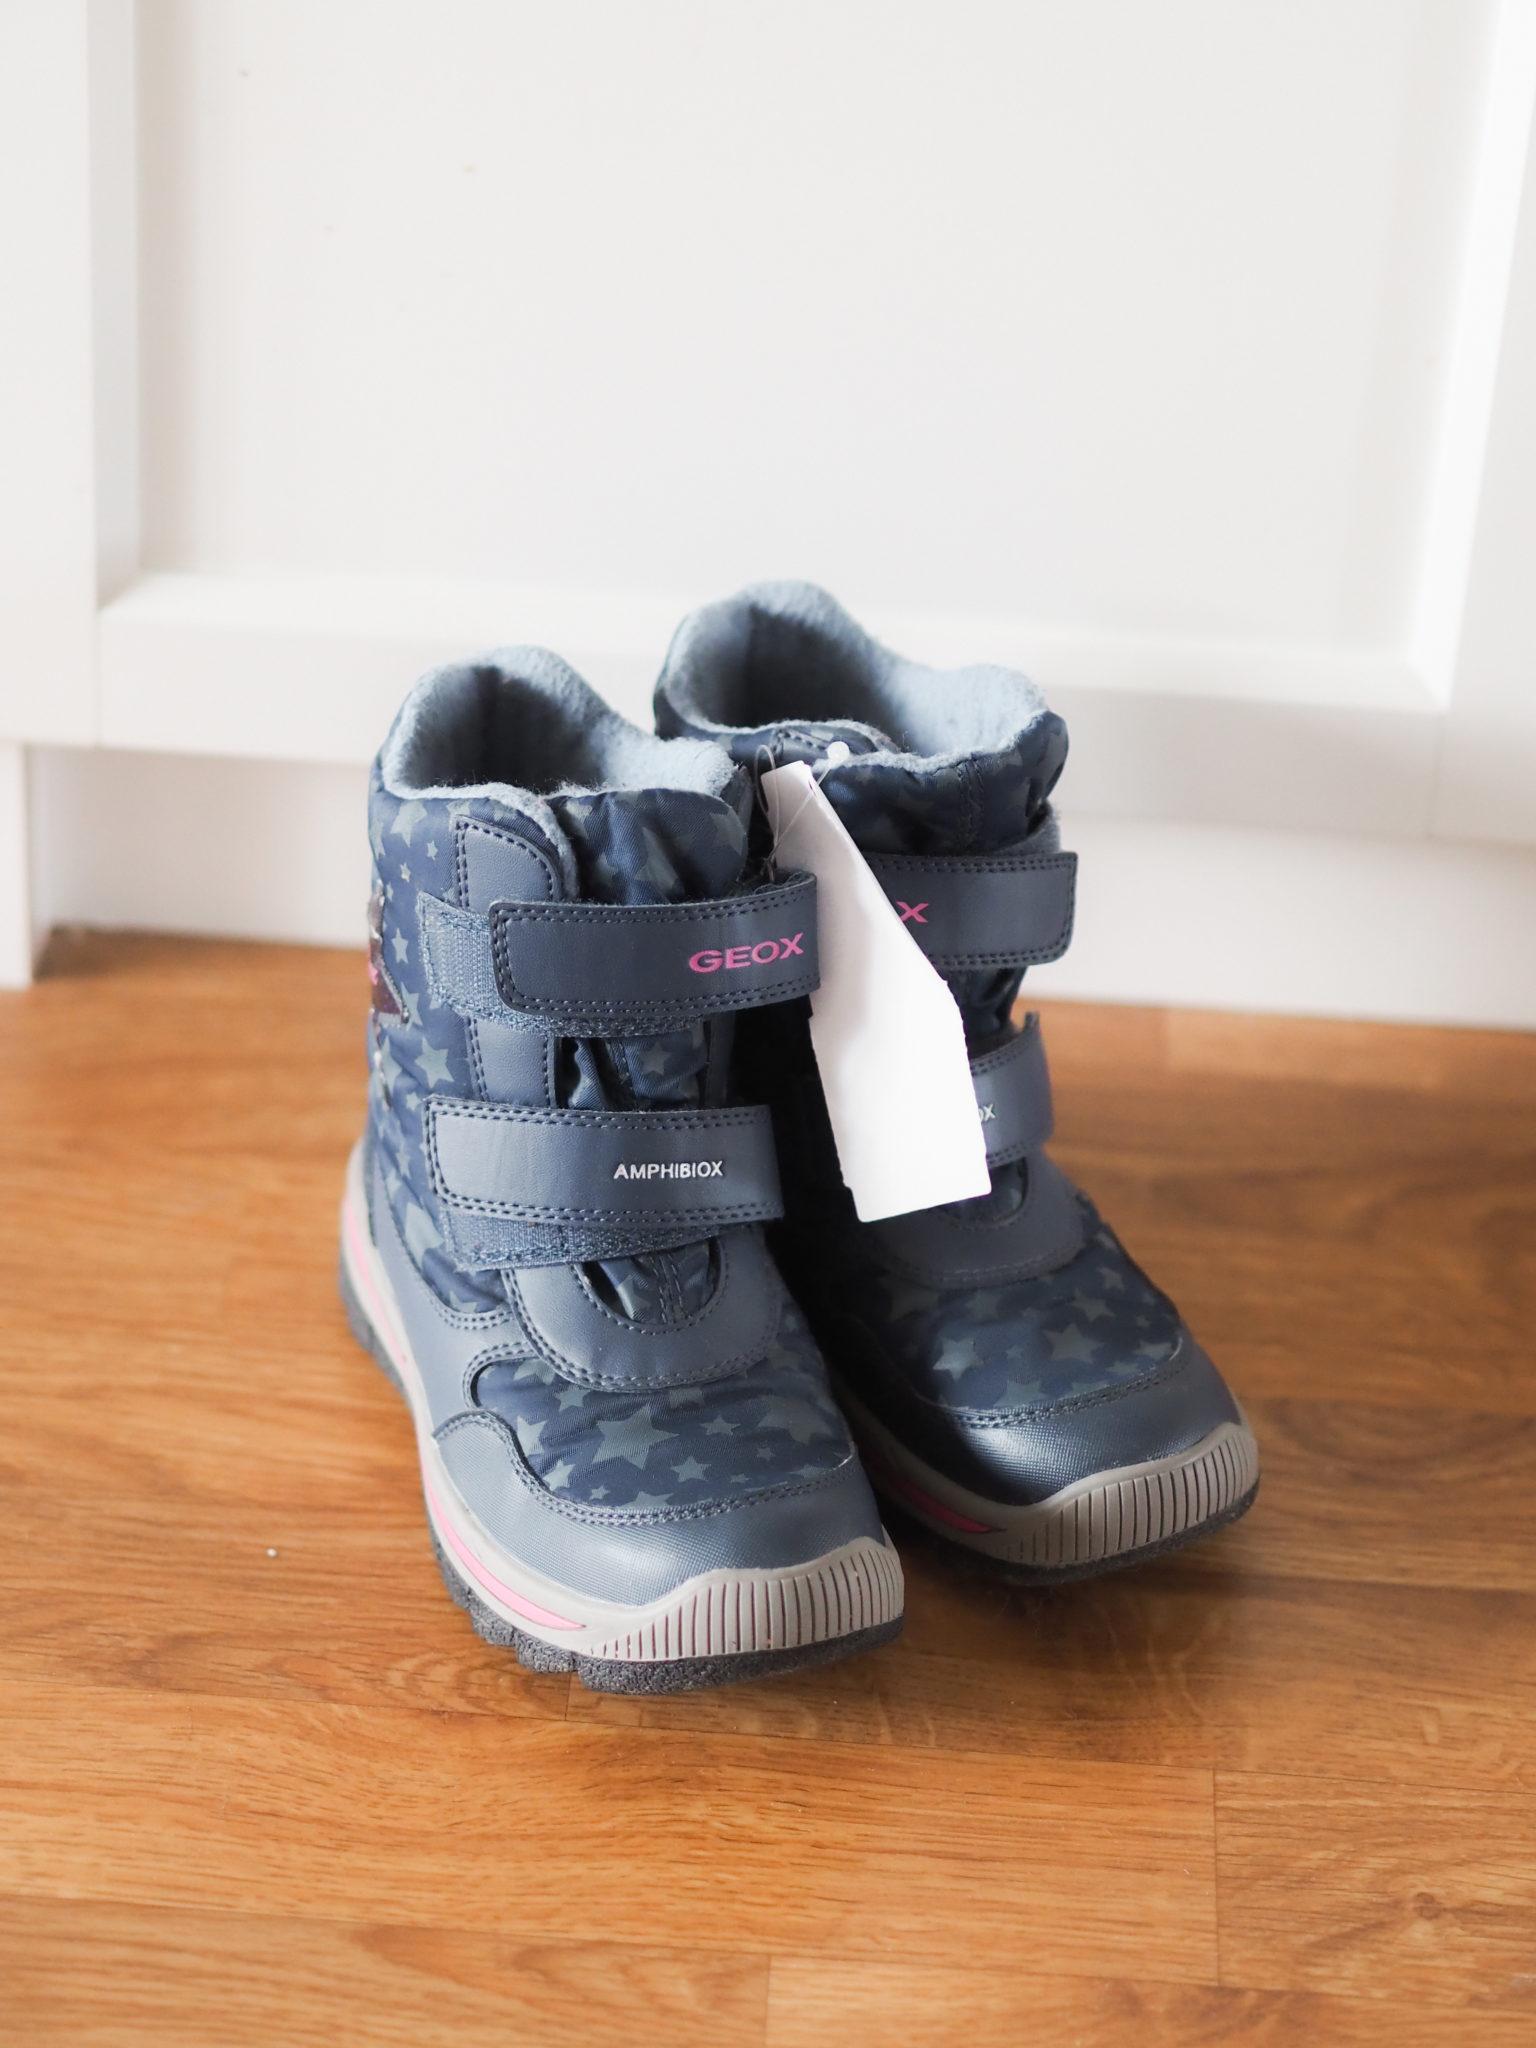 Kirppislöytö - Gore-tex kengät - BMH - Big mamas home by Jenni